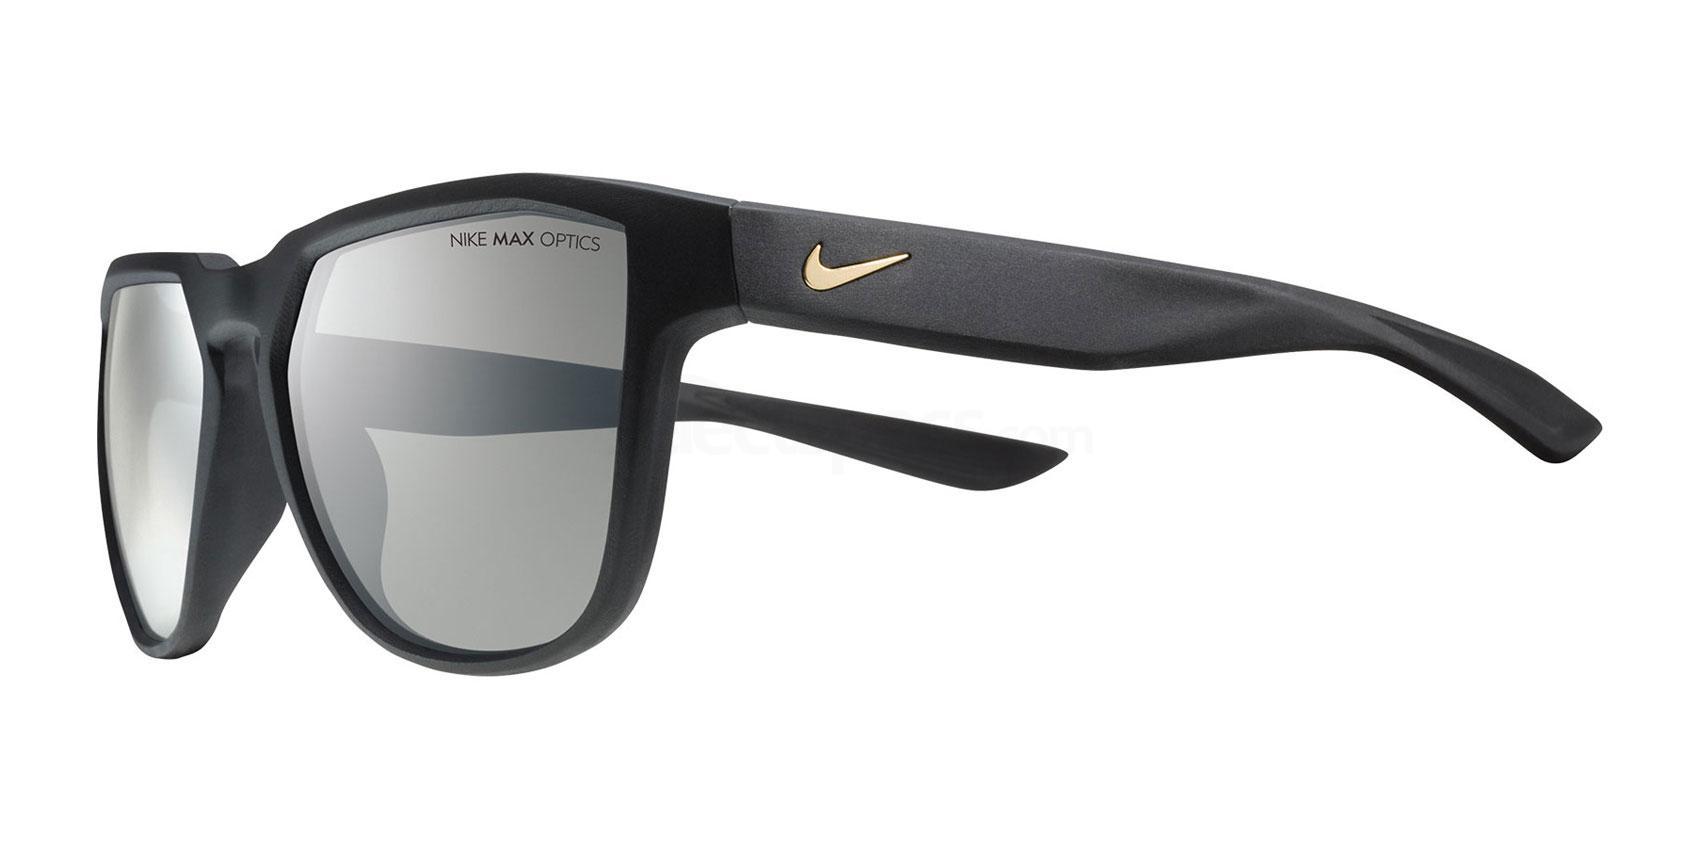 001 FLY SWIFT EV0926 Sunglasses, Nike